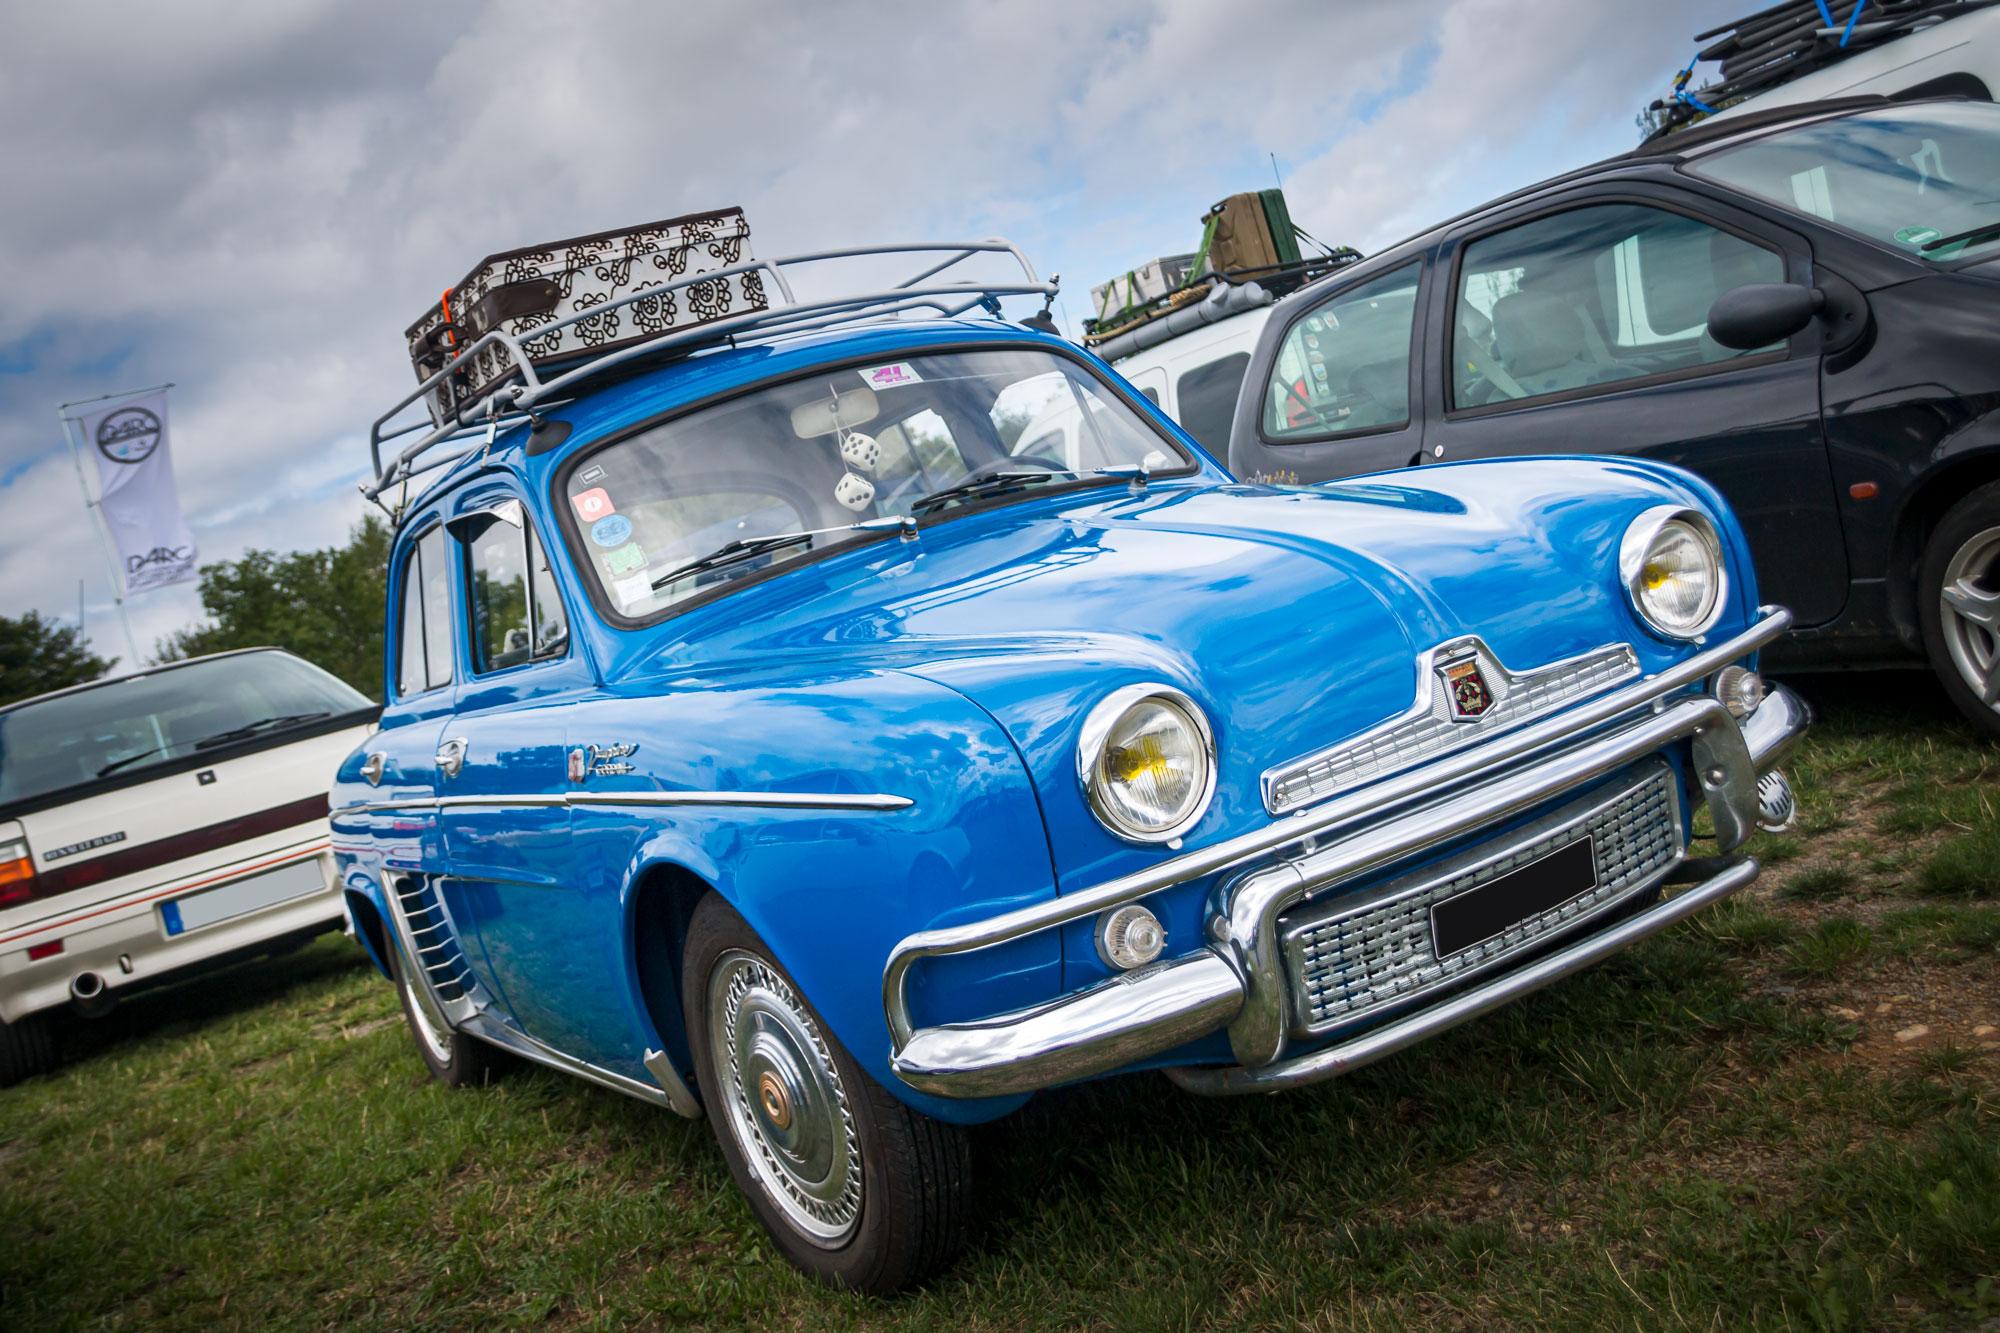 Renault Dauphine - D'ARC Sommerfest 2019 am Nürburgring